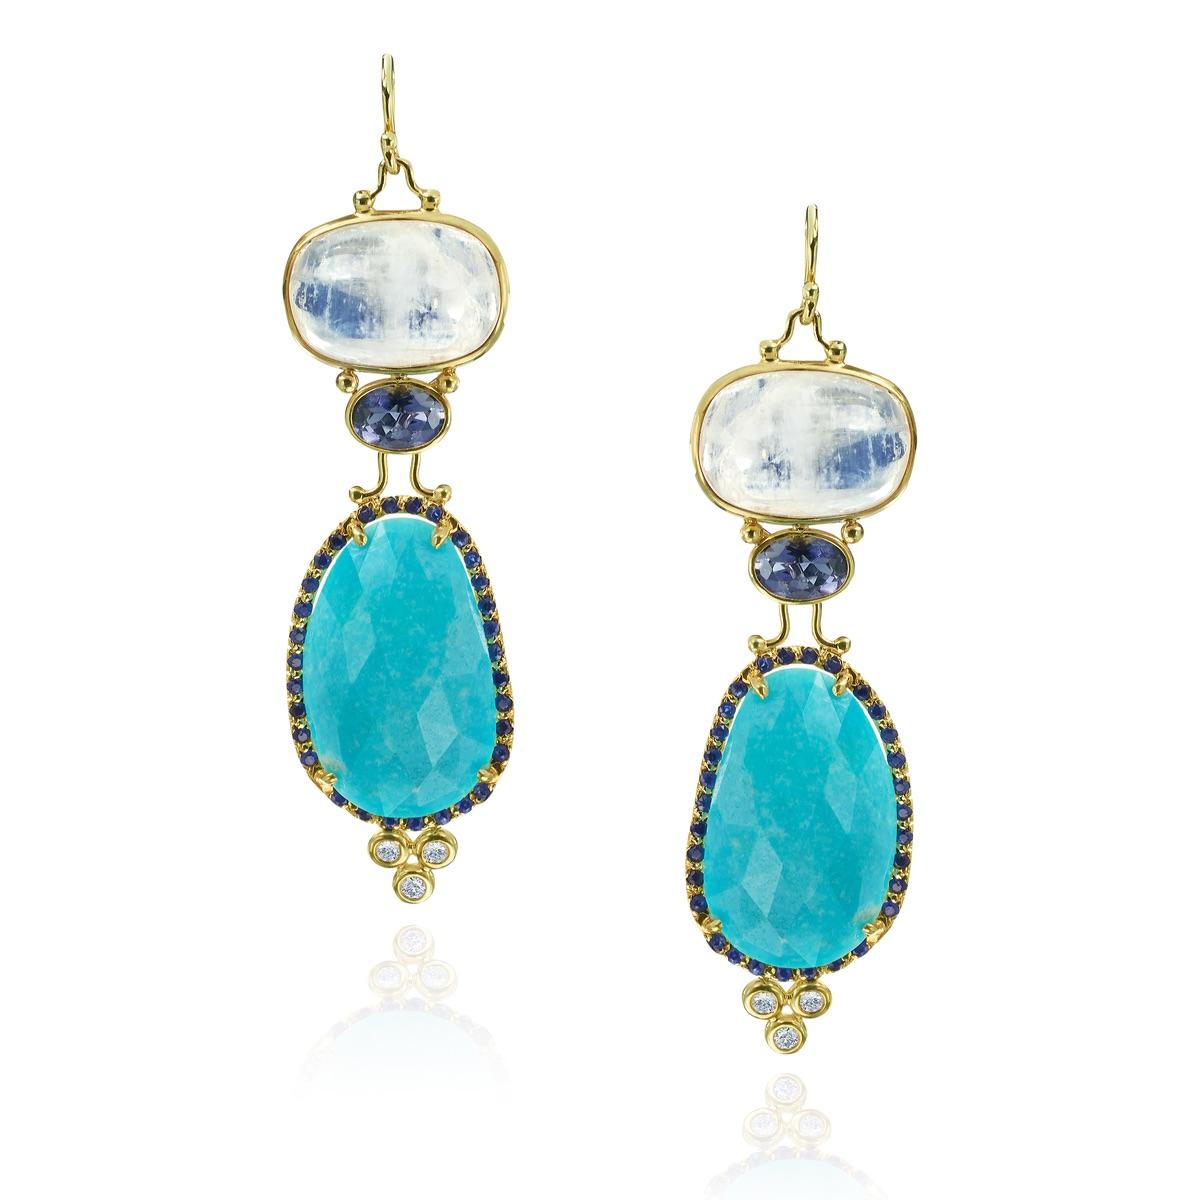 The Jewel - Mazza - Lookbook - Blue and Gold Drop Earrings